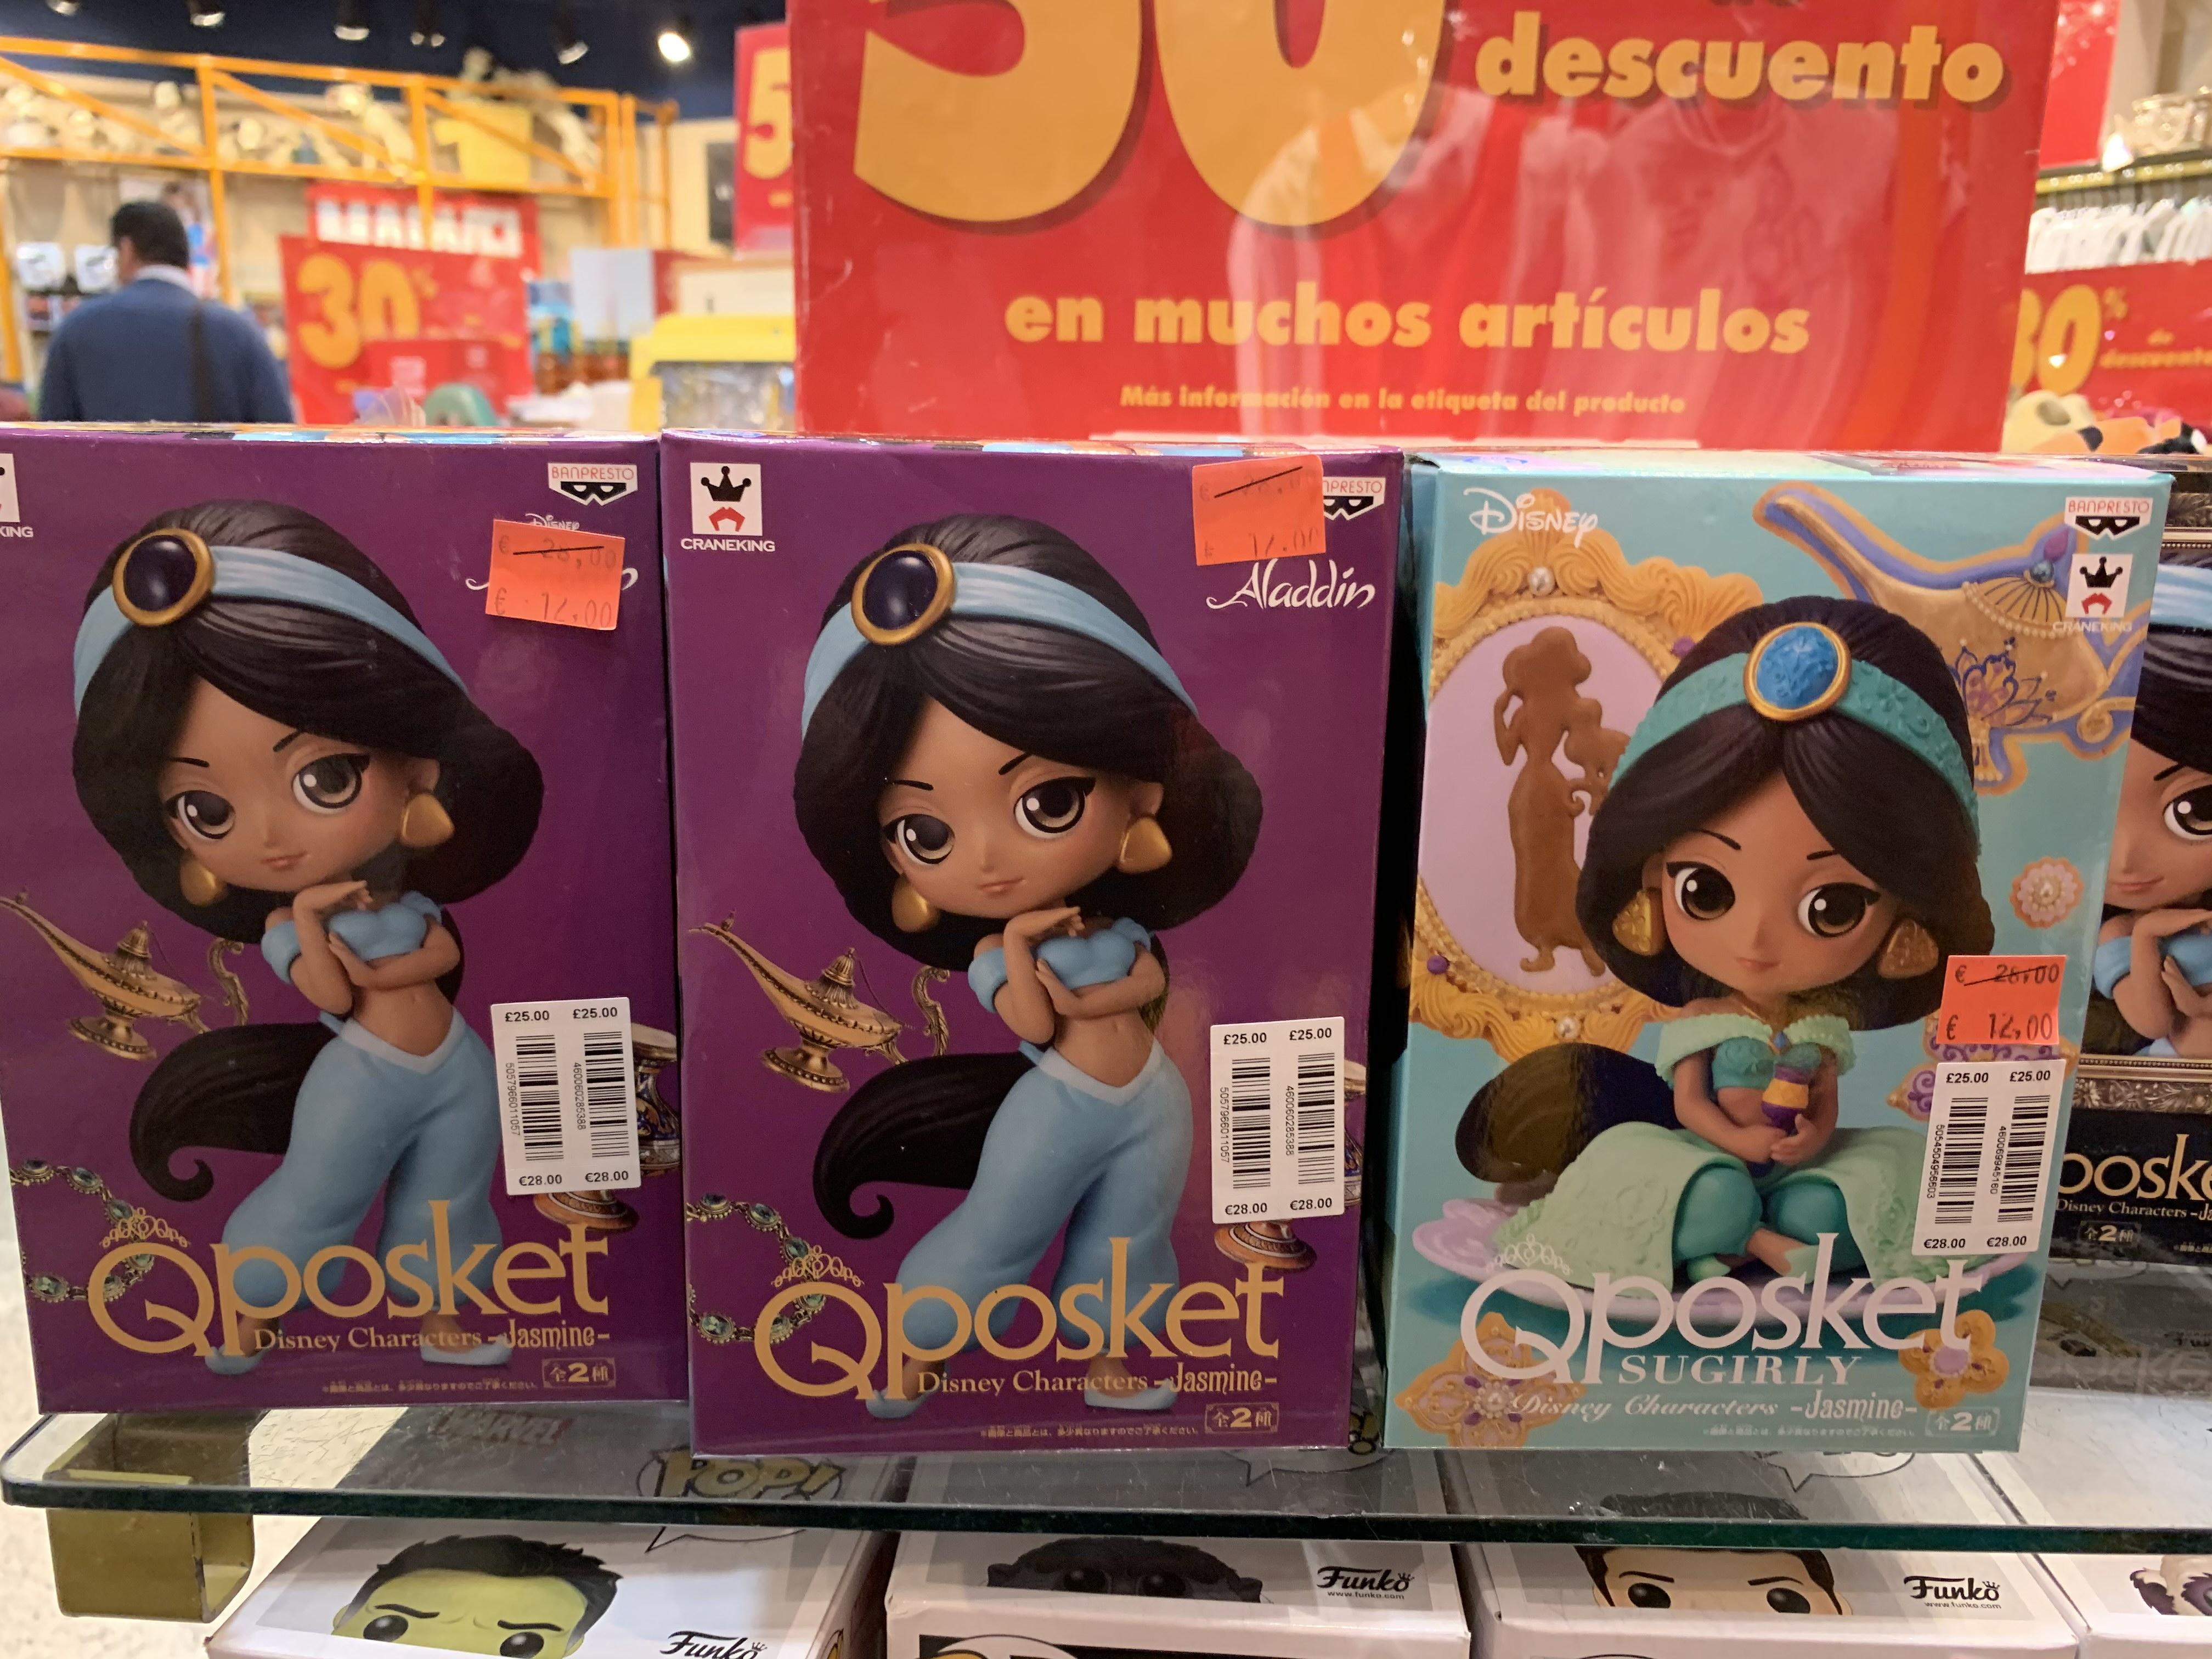 Figura premium DISNEY Qposket- Jasmine (Disney Murcia)